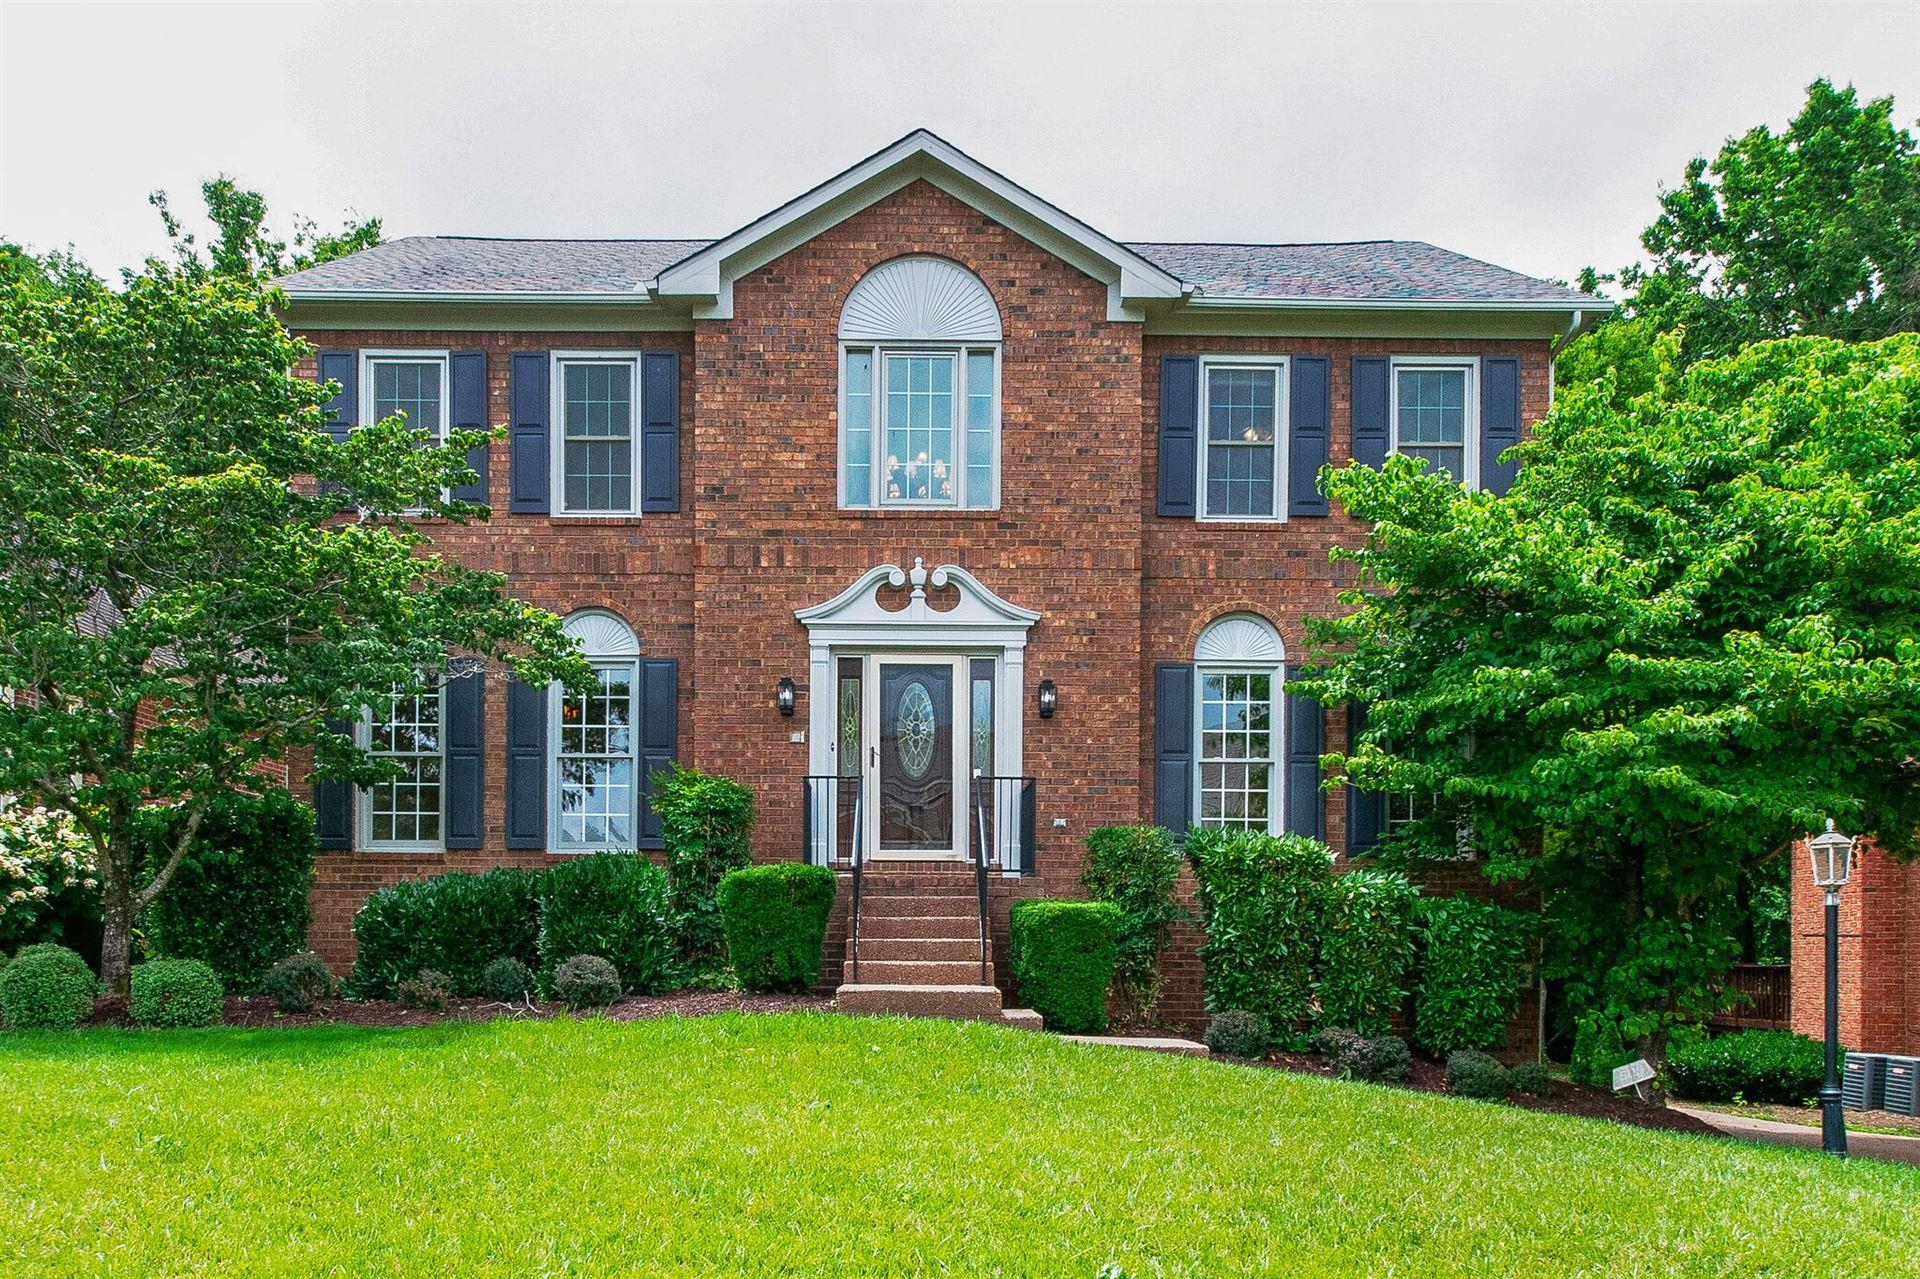 5021 Fredericksburg Way E, Brentwood, TN 37027 - MLS#: 2262418